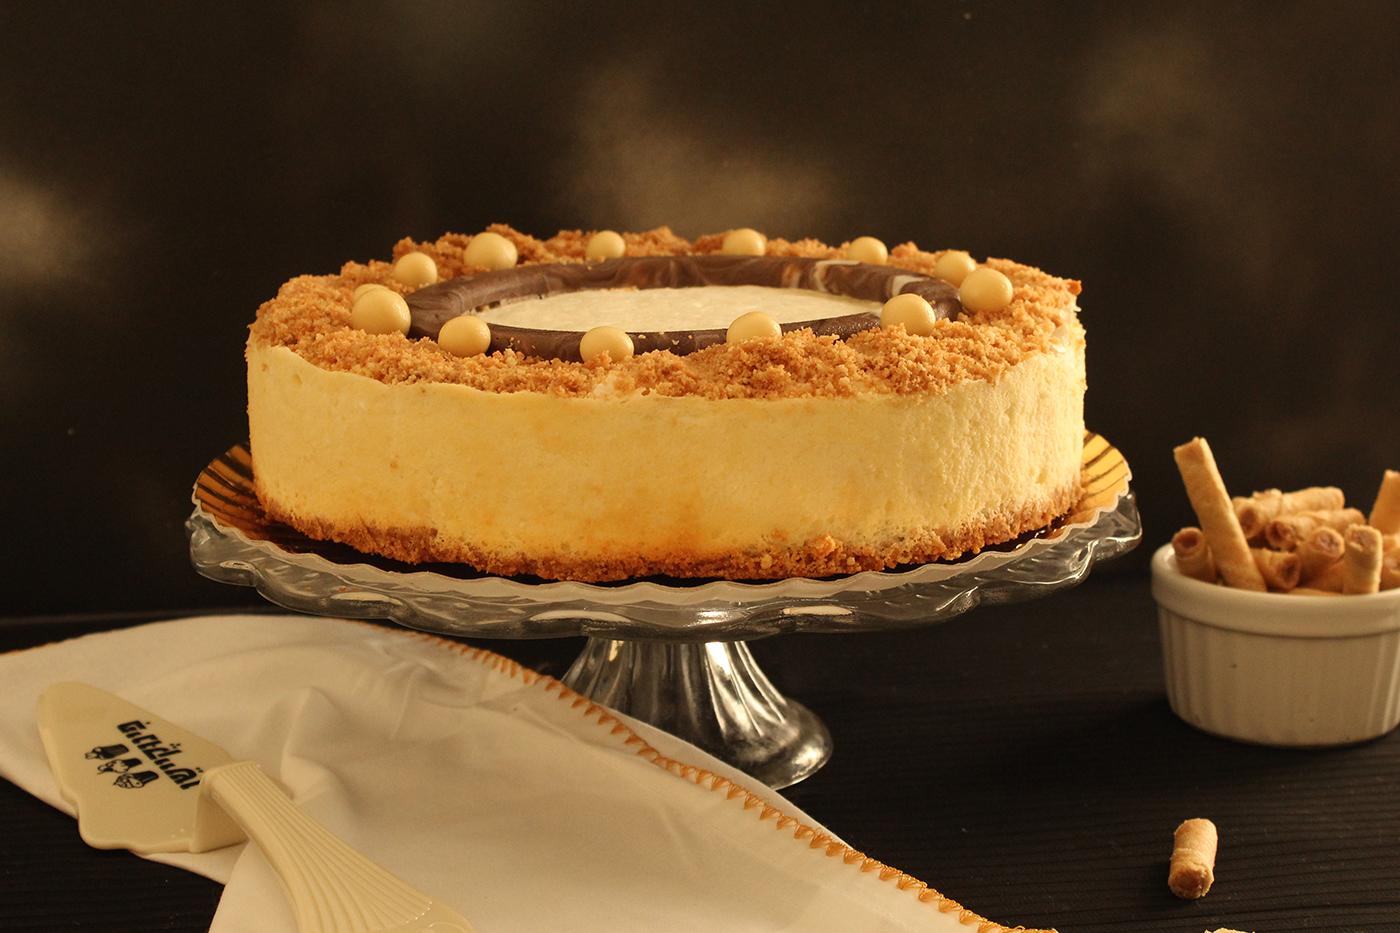 IMG 8282 - עוגת גבינה גבוהה וטעימה